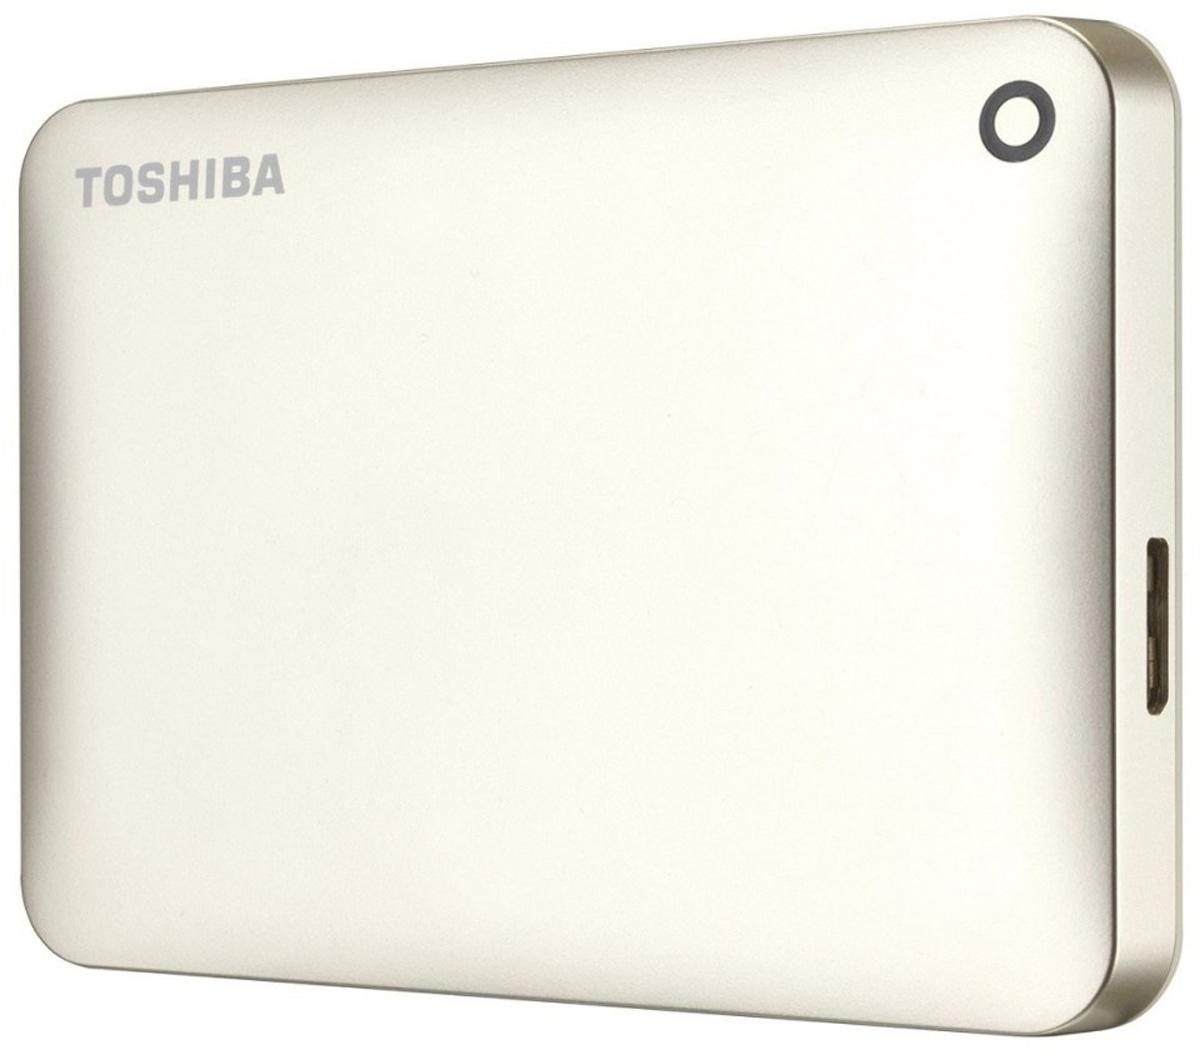 Toshiba Canvio Connect II 3TB, Gold внешний жесткий диск (HDTC830EC3CA)